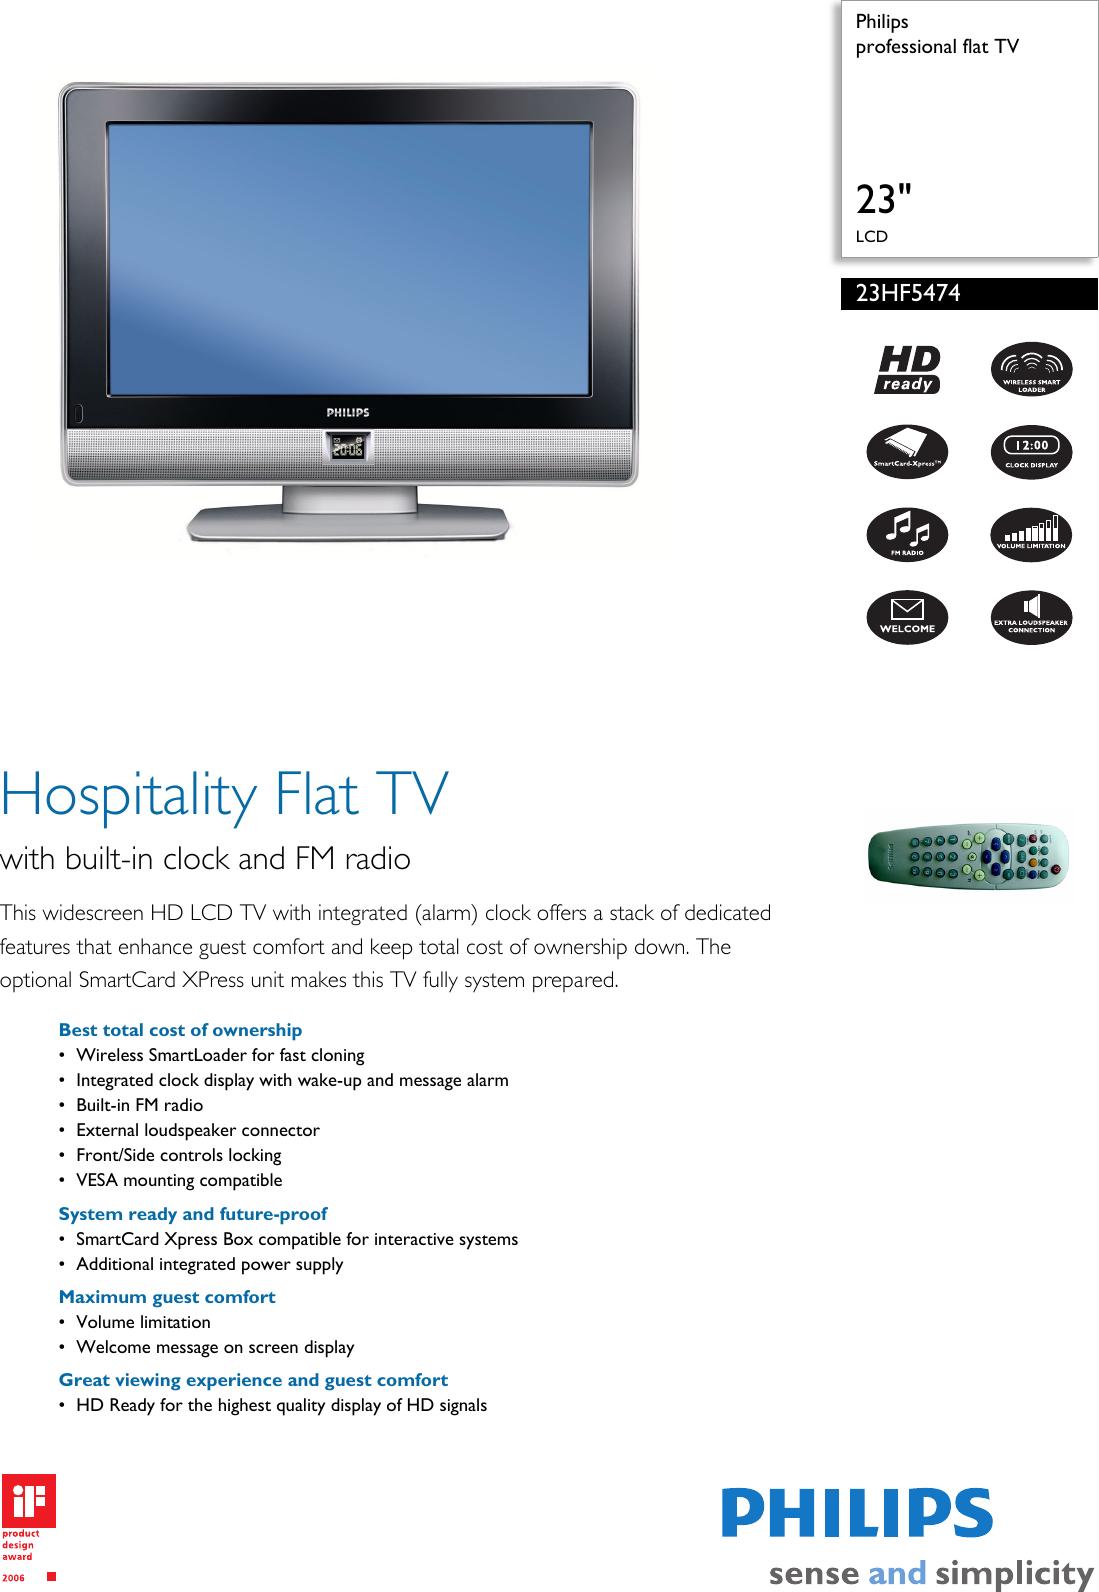 philips 23hf5474 users manual 23hf5474 10 professional flat tv rh usermanual wiki Philips Smart TV 32 Philips Smart TV 32